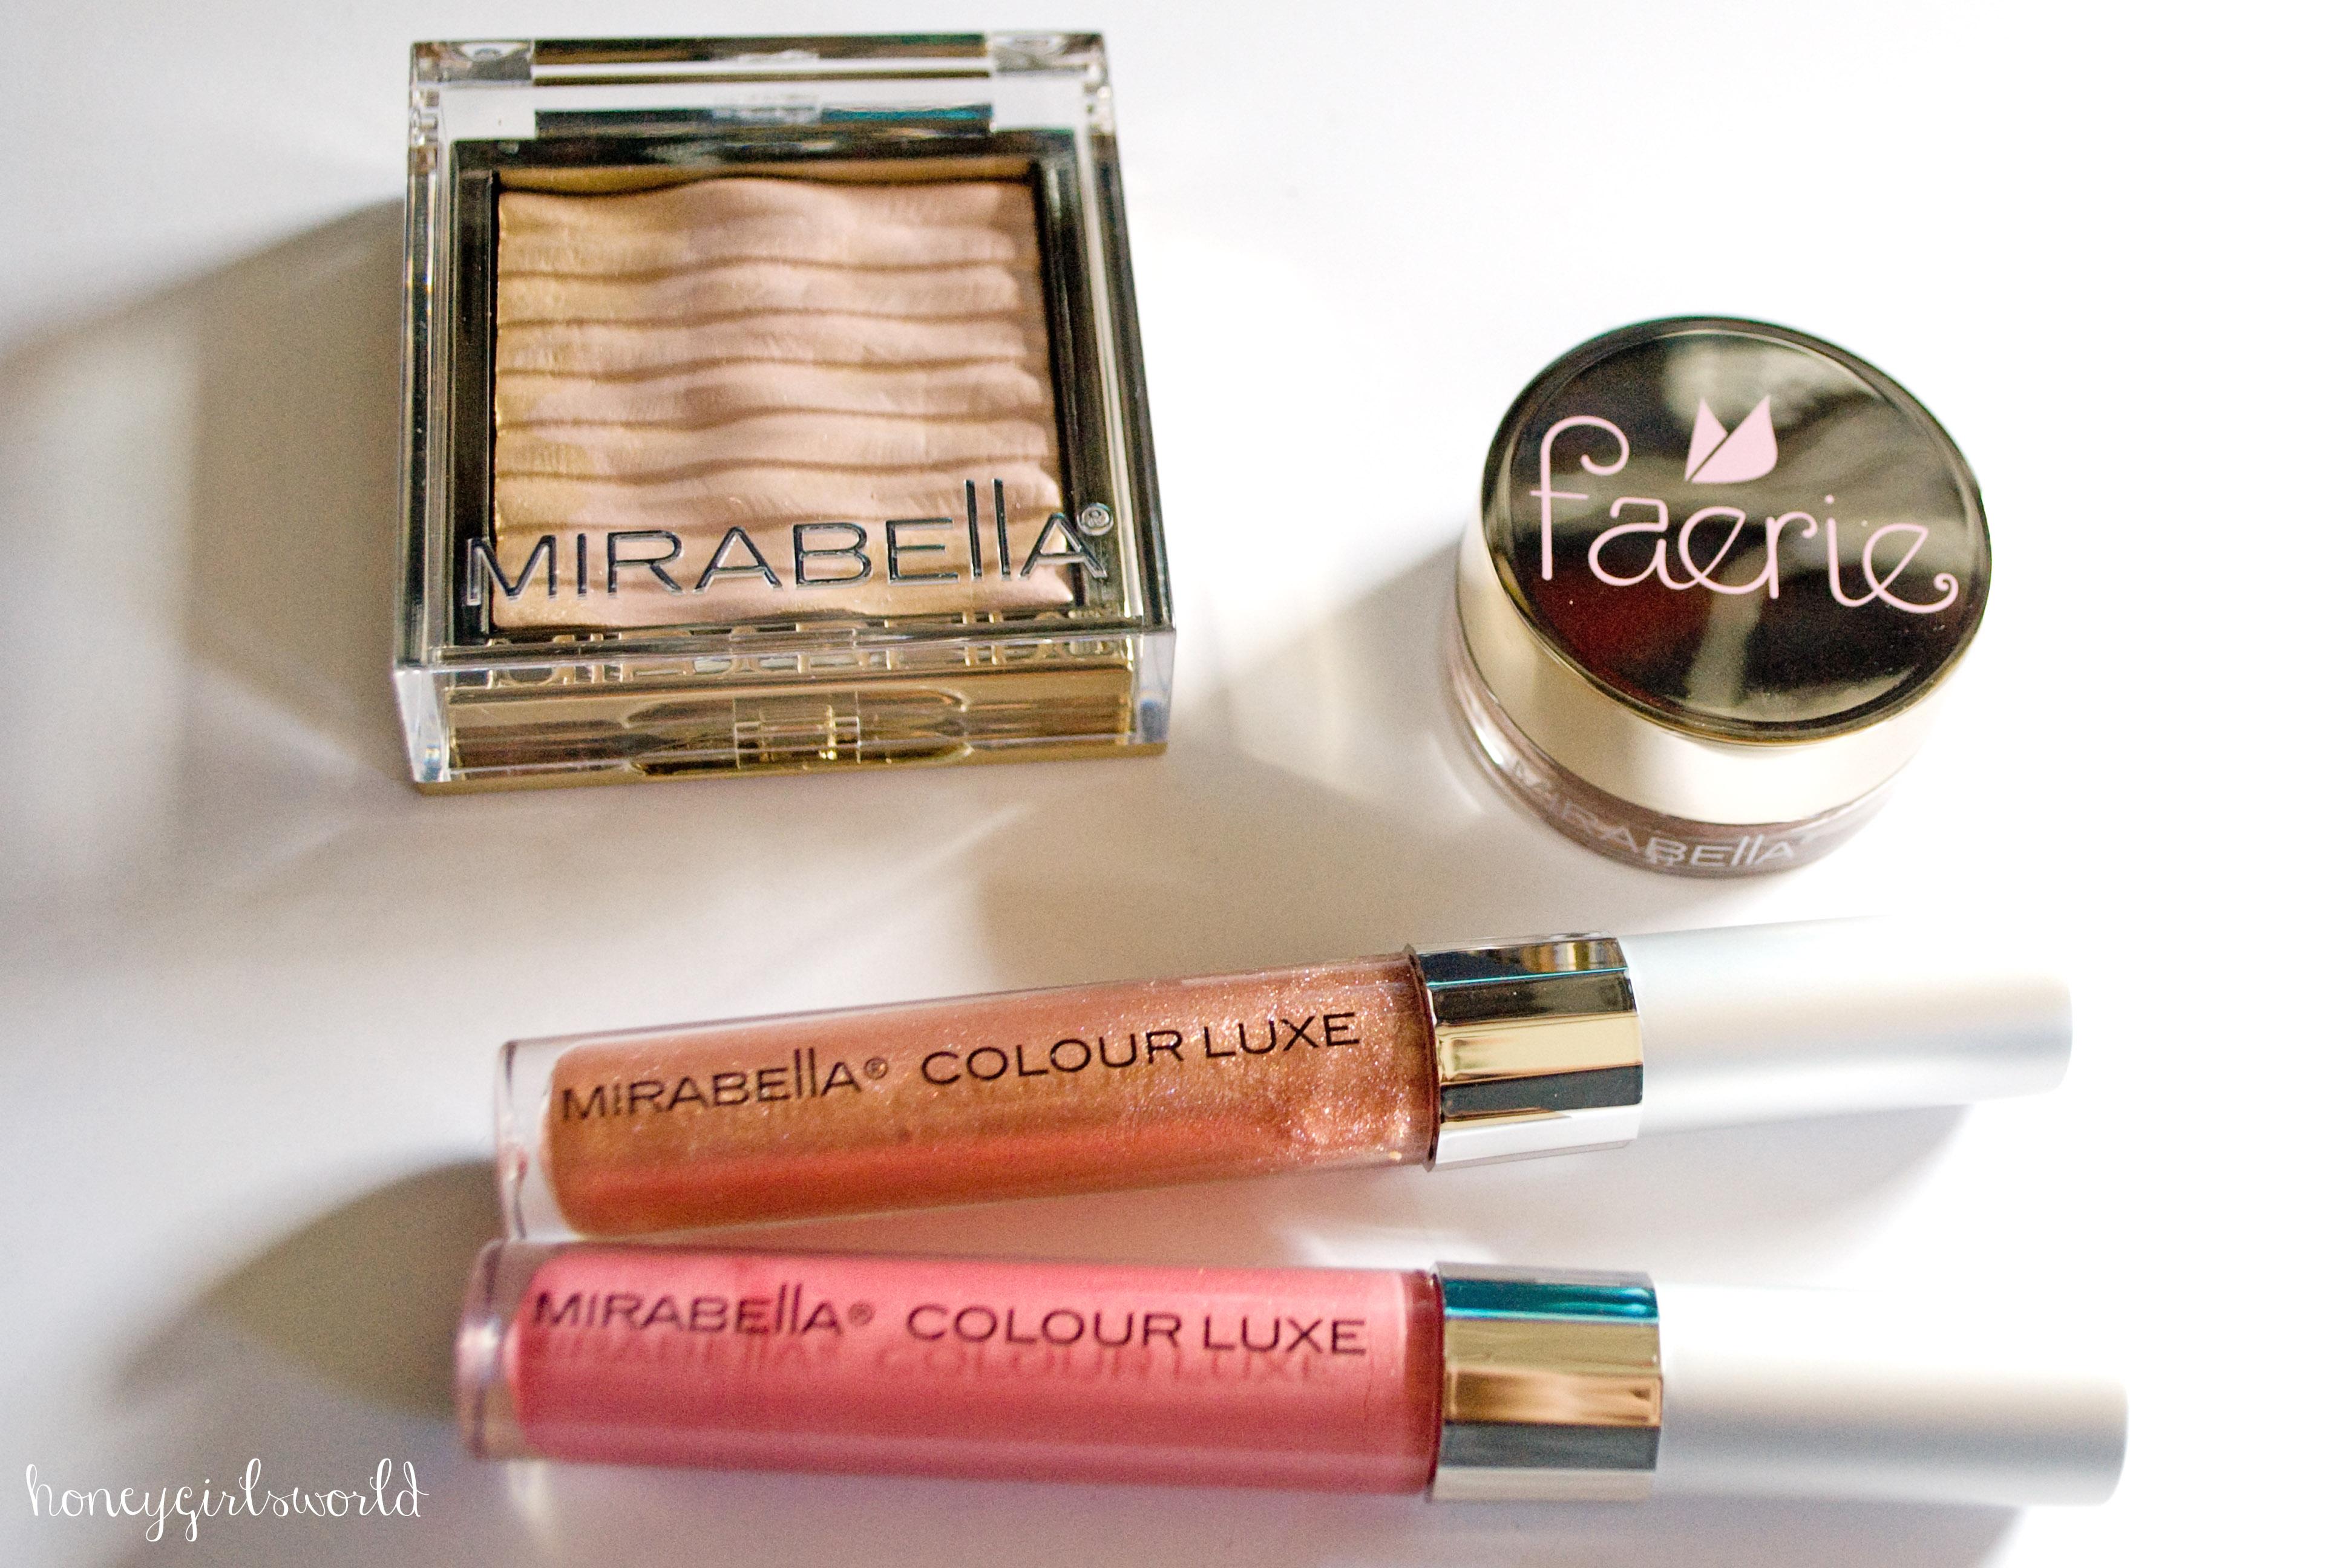 Mirabella Cosmetics Faerie